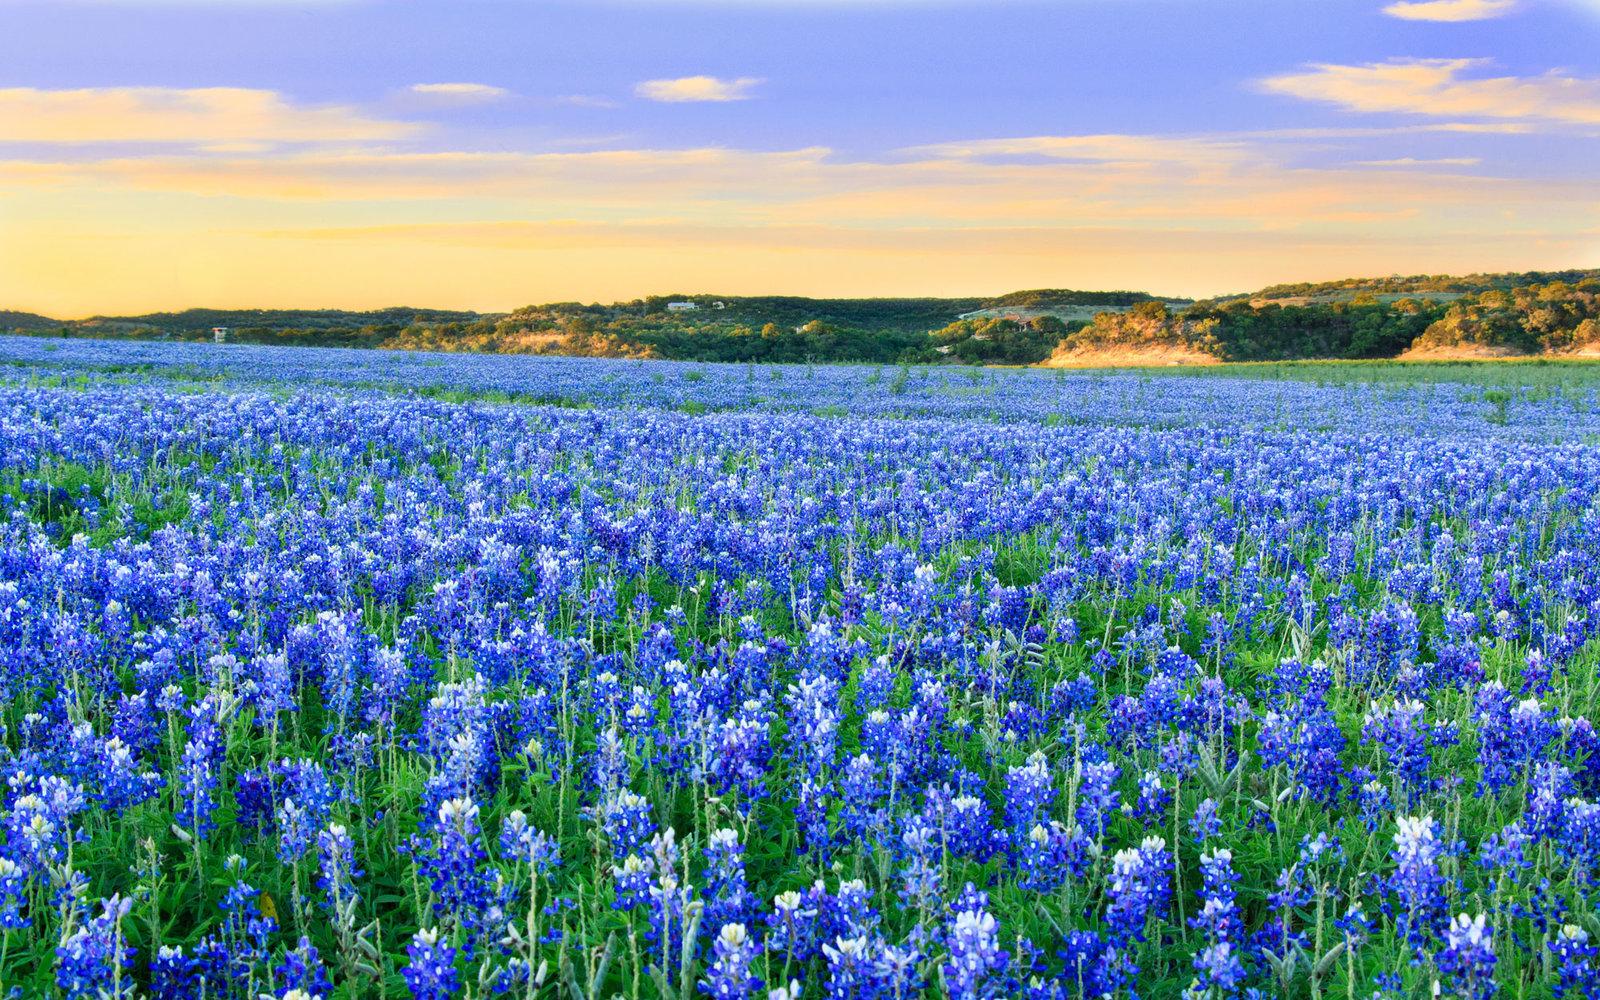 Texas-Bluebonnets-Spring-15-TXBLOOMS0316.jpg